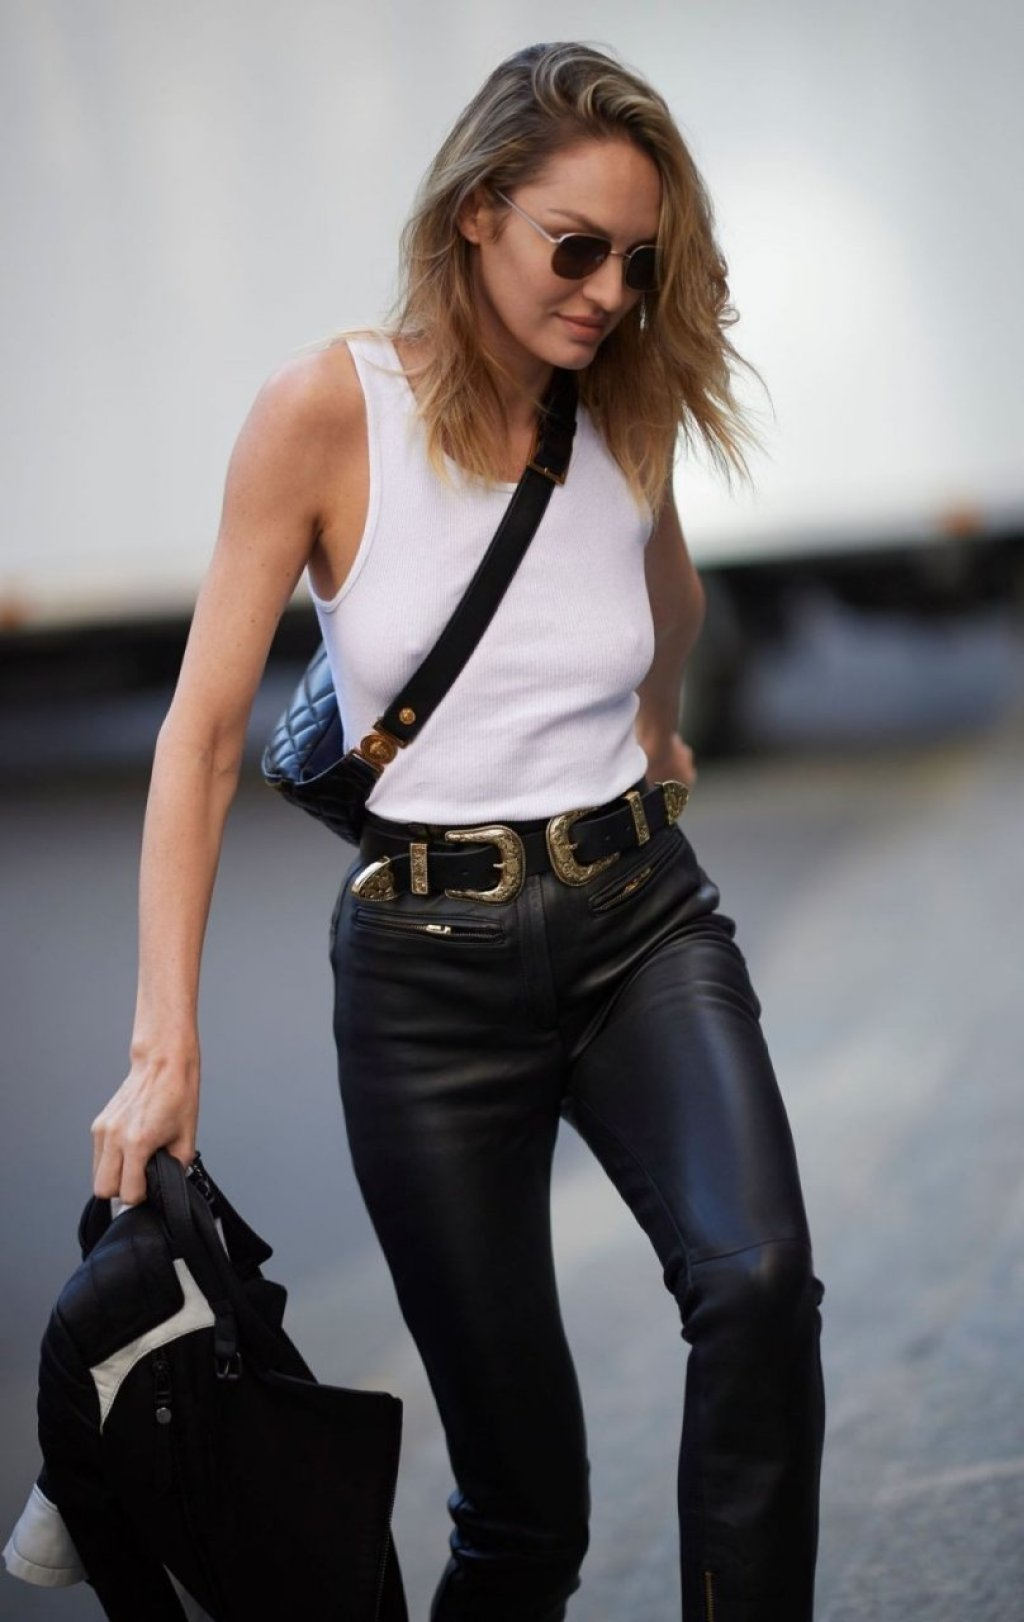 Candice Swanepoel Braless (16 Photos)